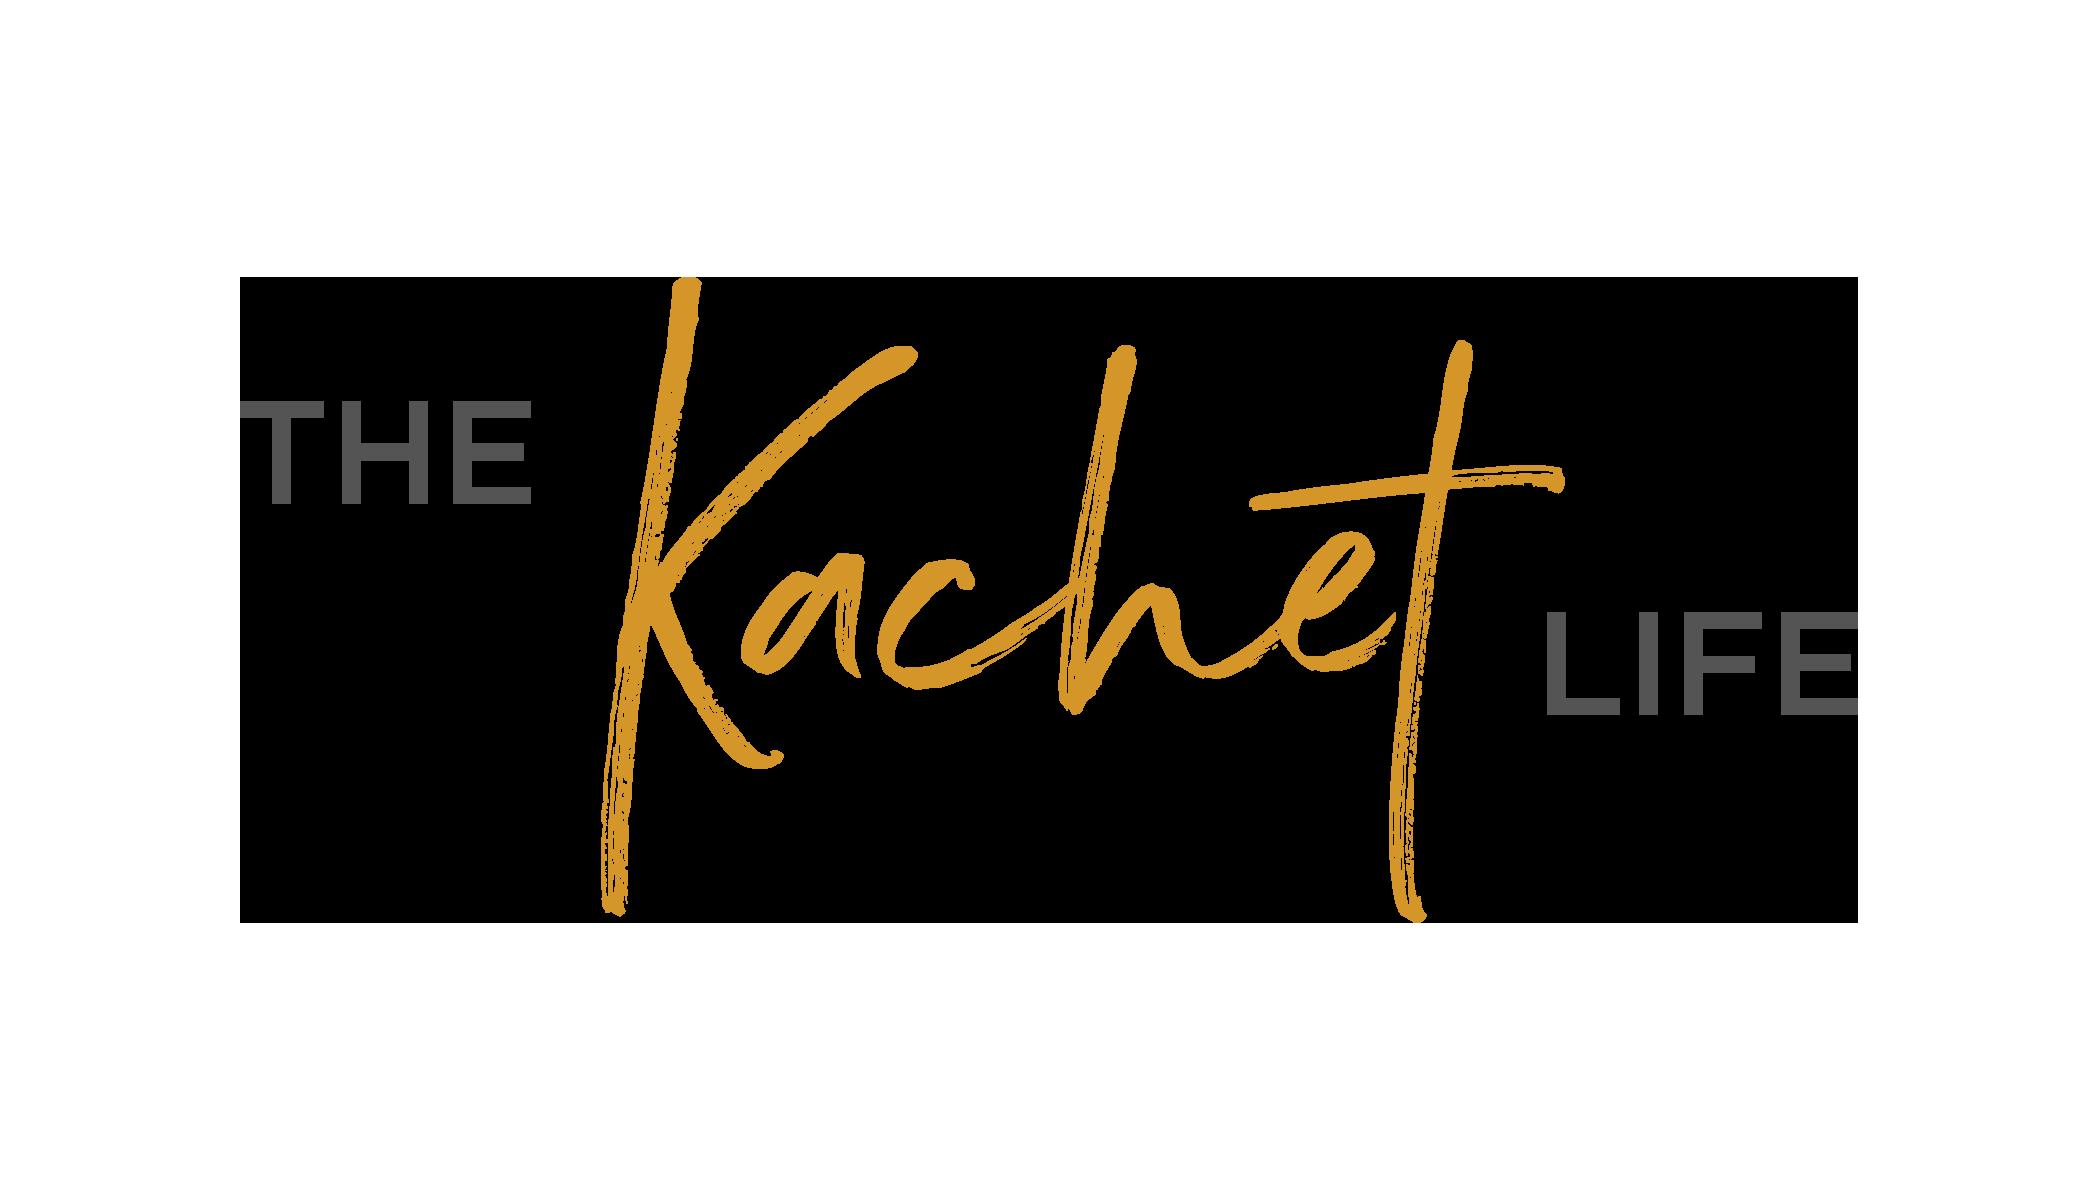 The_Kachet_Life.png